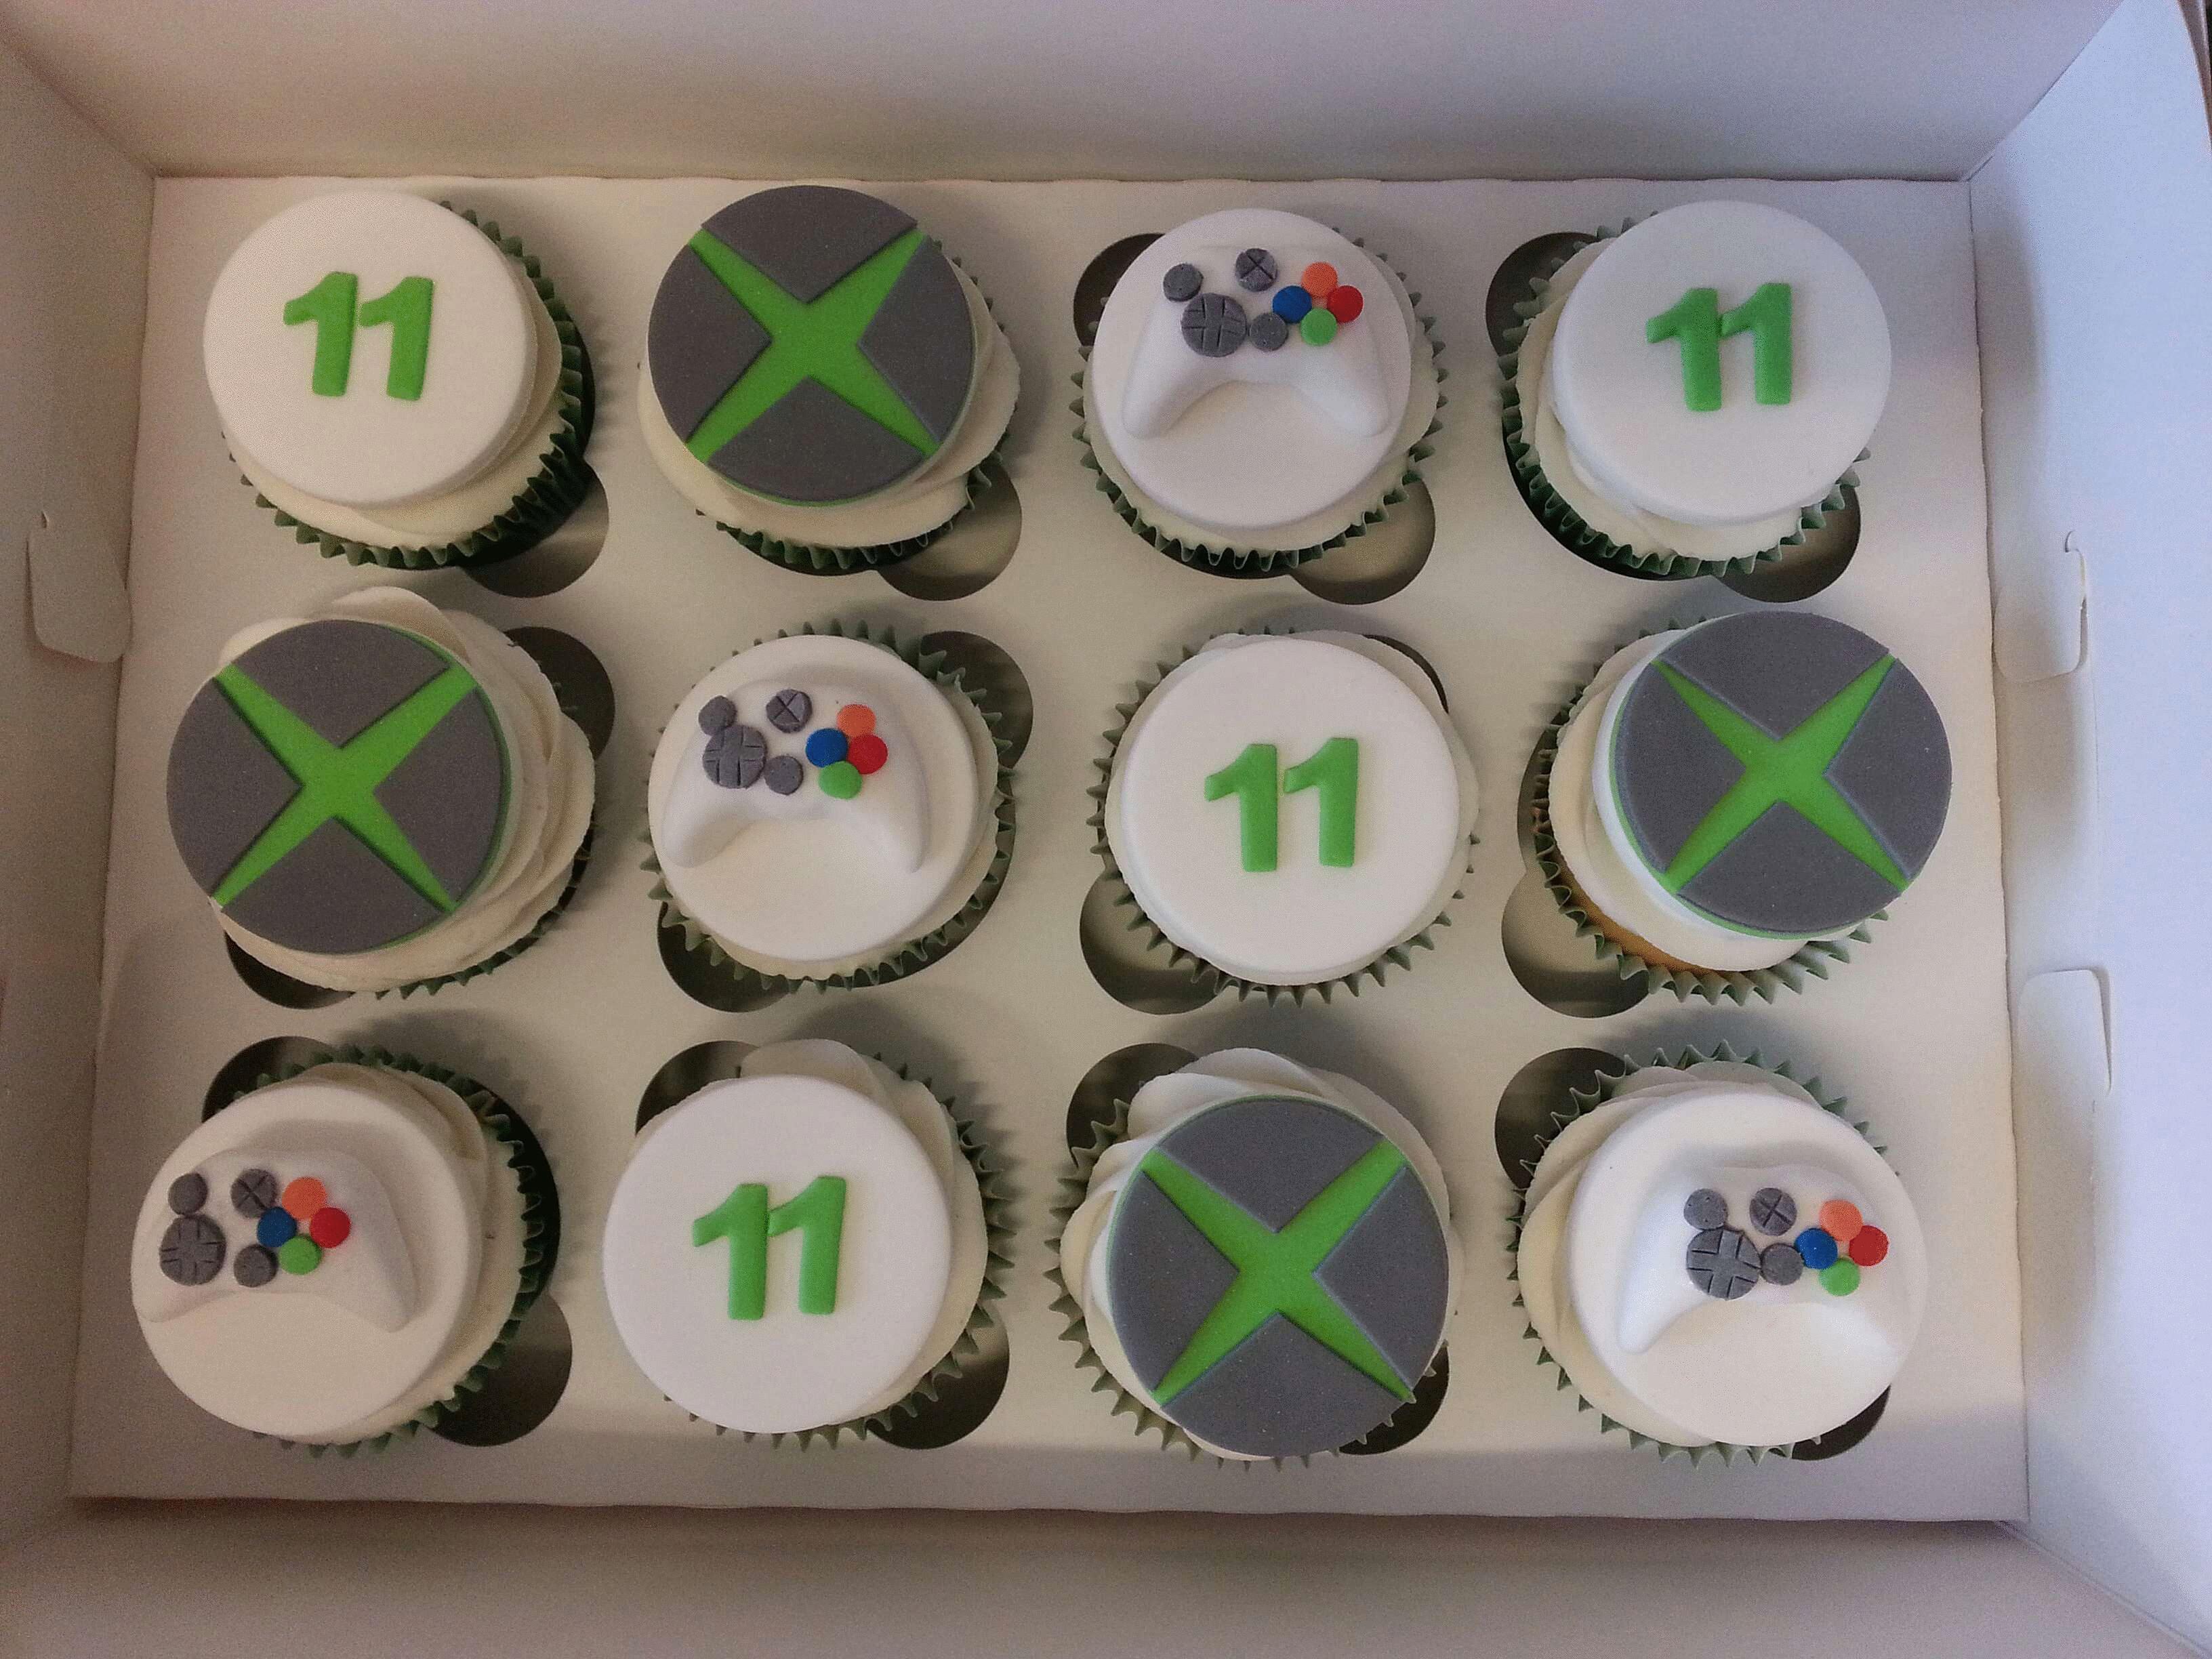 Cake decorating supplies near liverpool